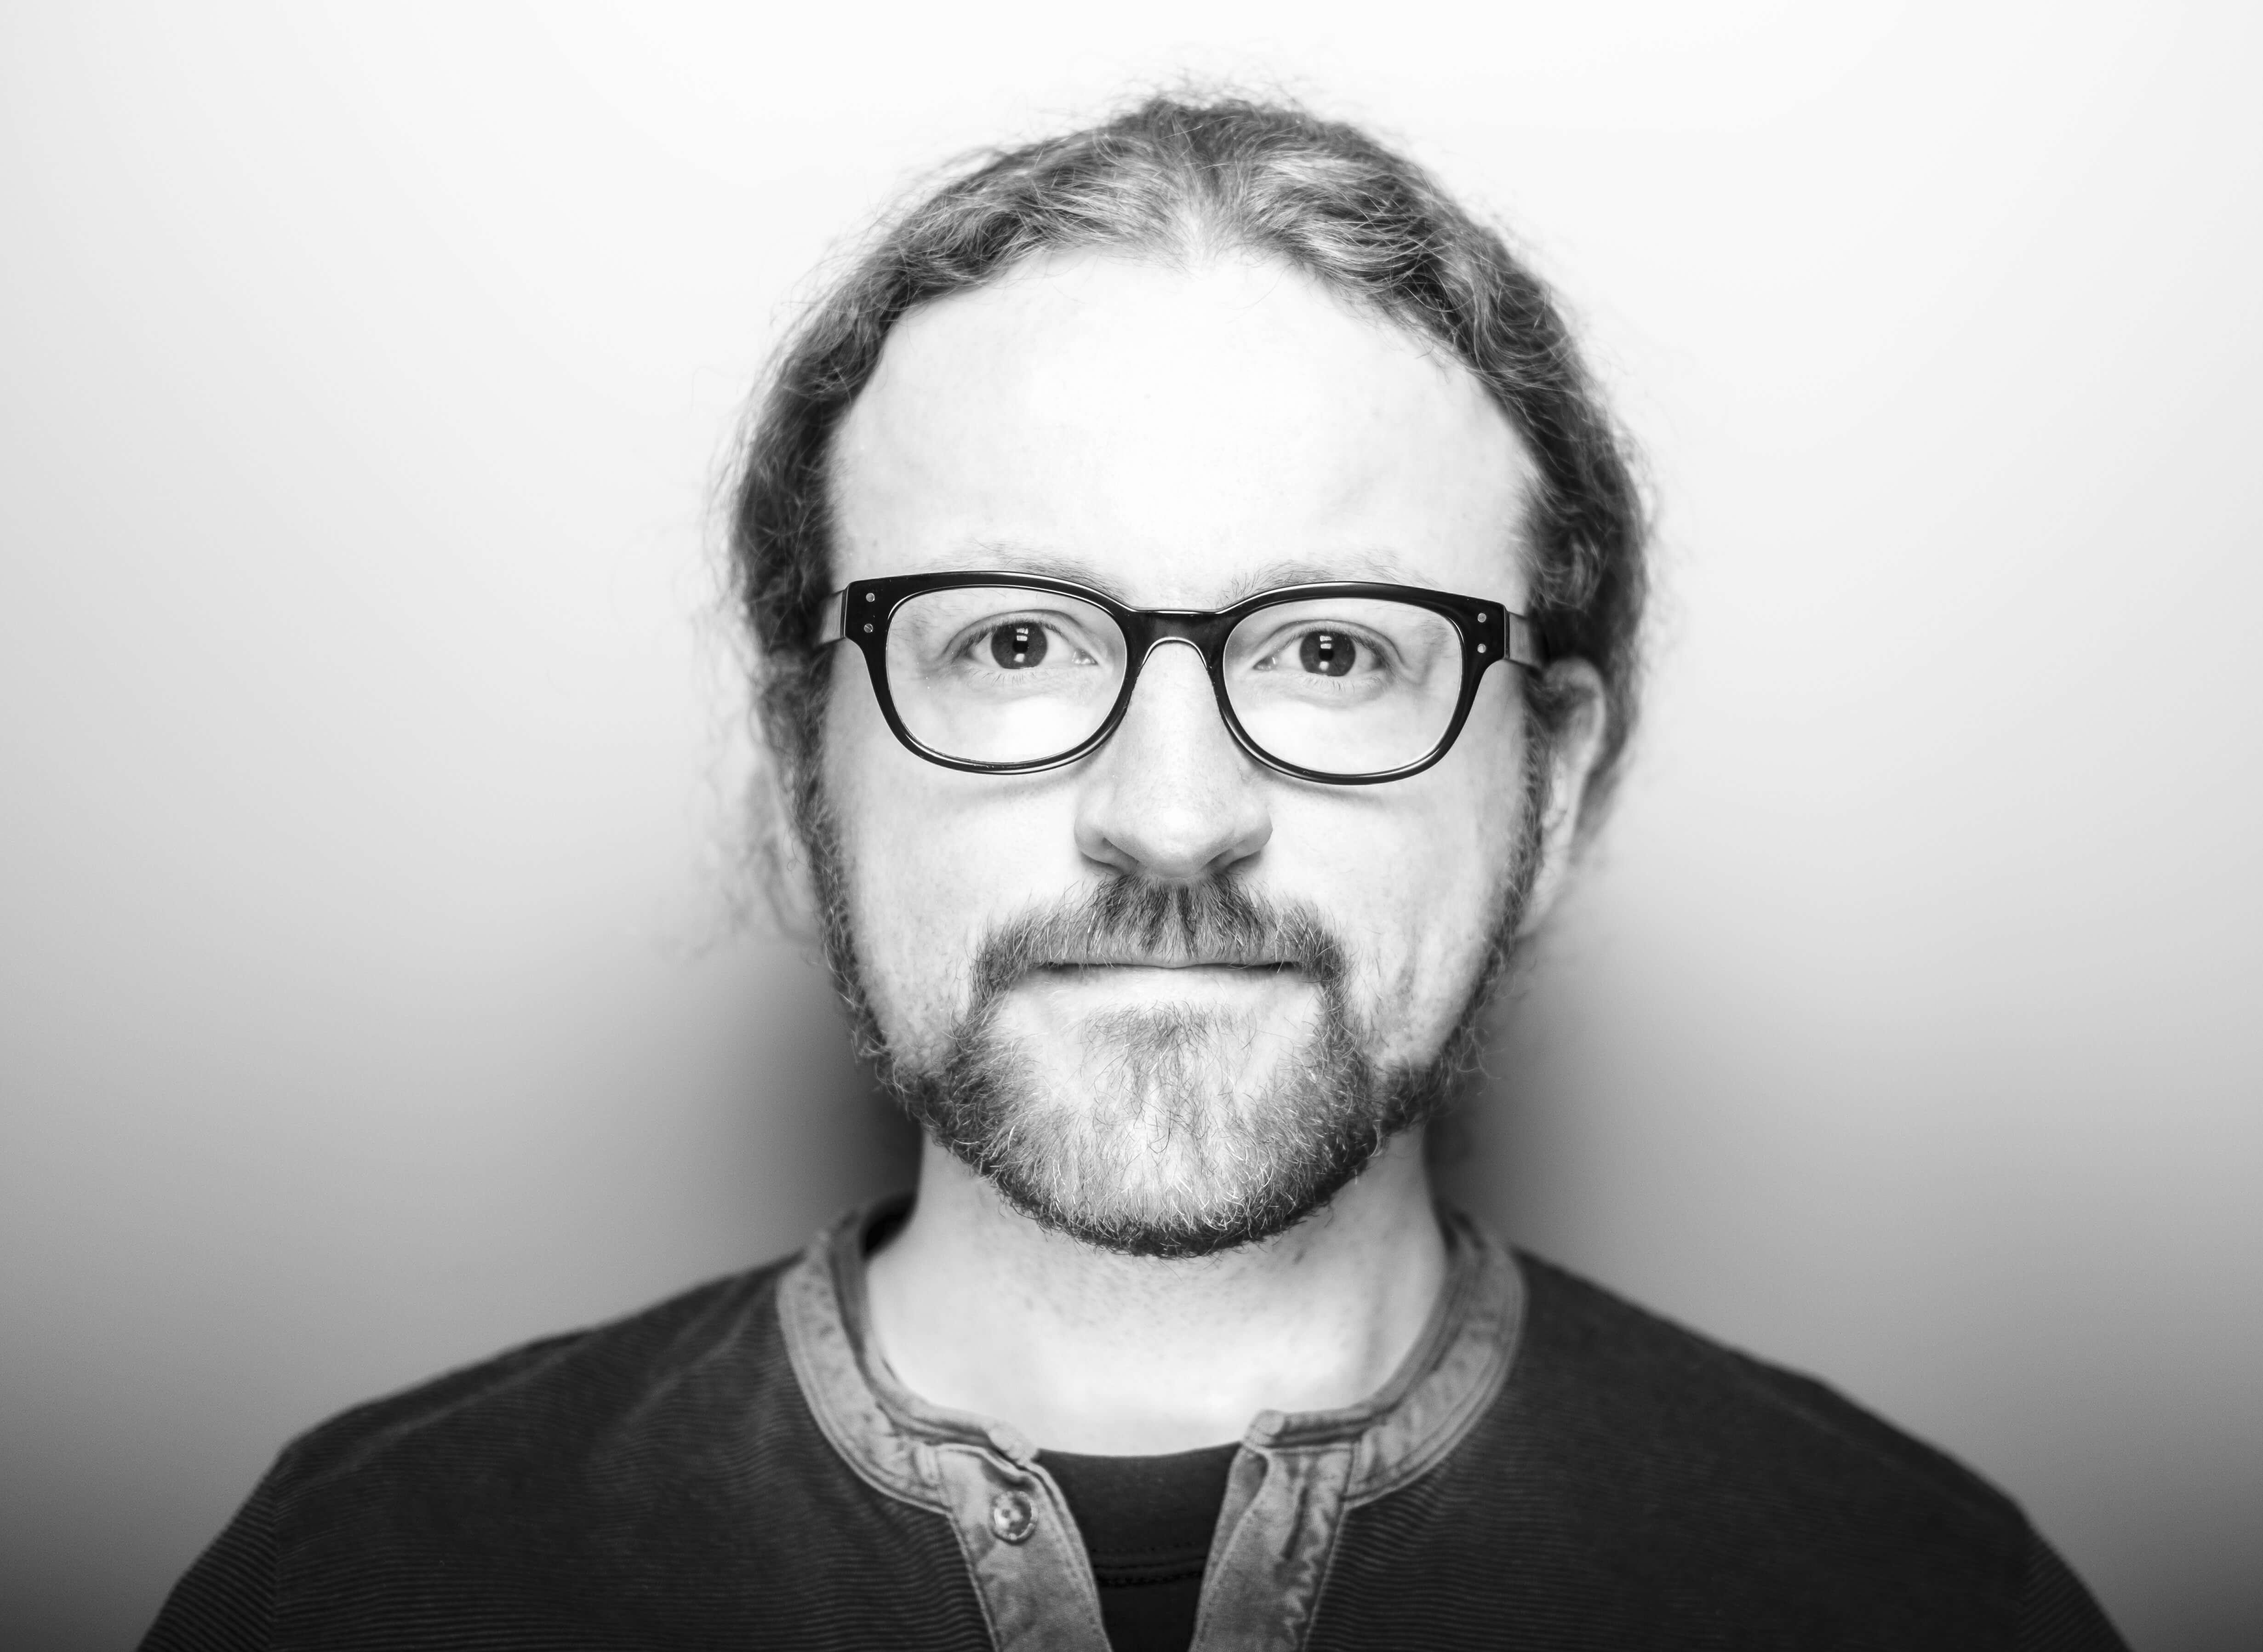 Profilbild Christian Balbach